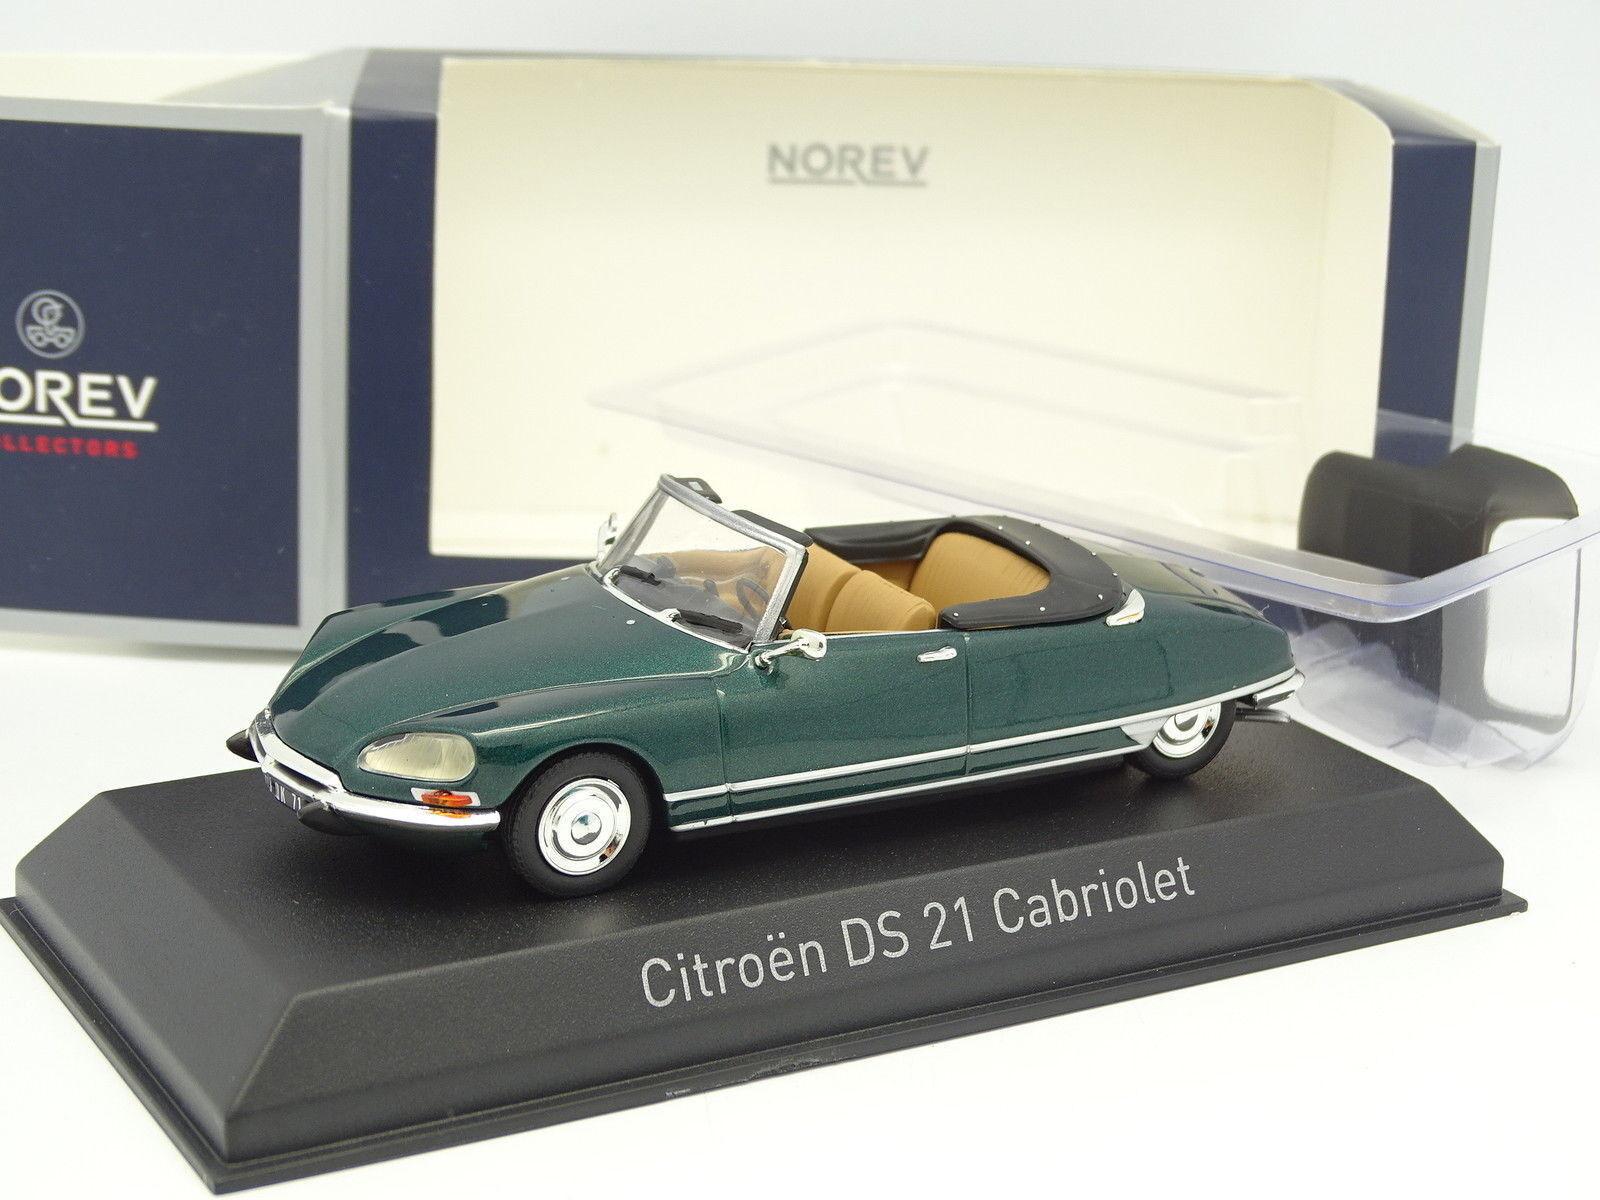 Norev 1 43 - citroen DS 21 Cabriolet grün